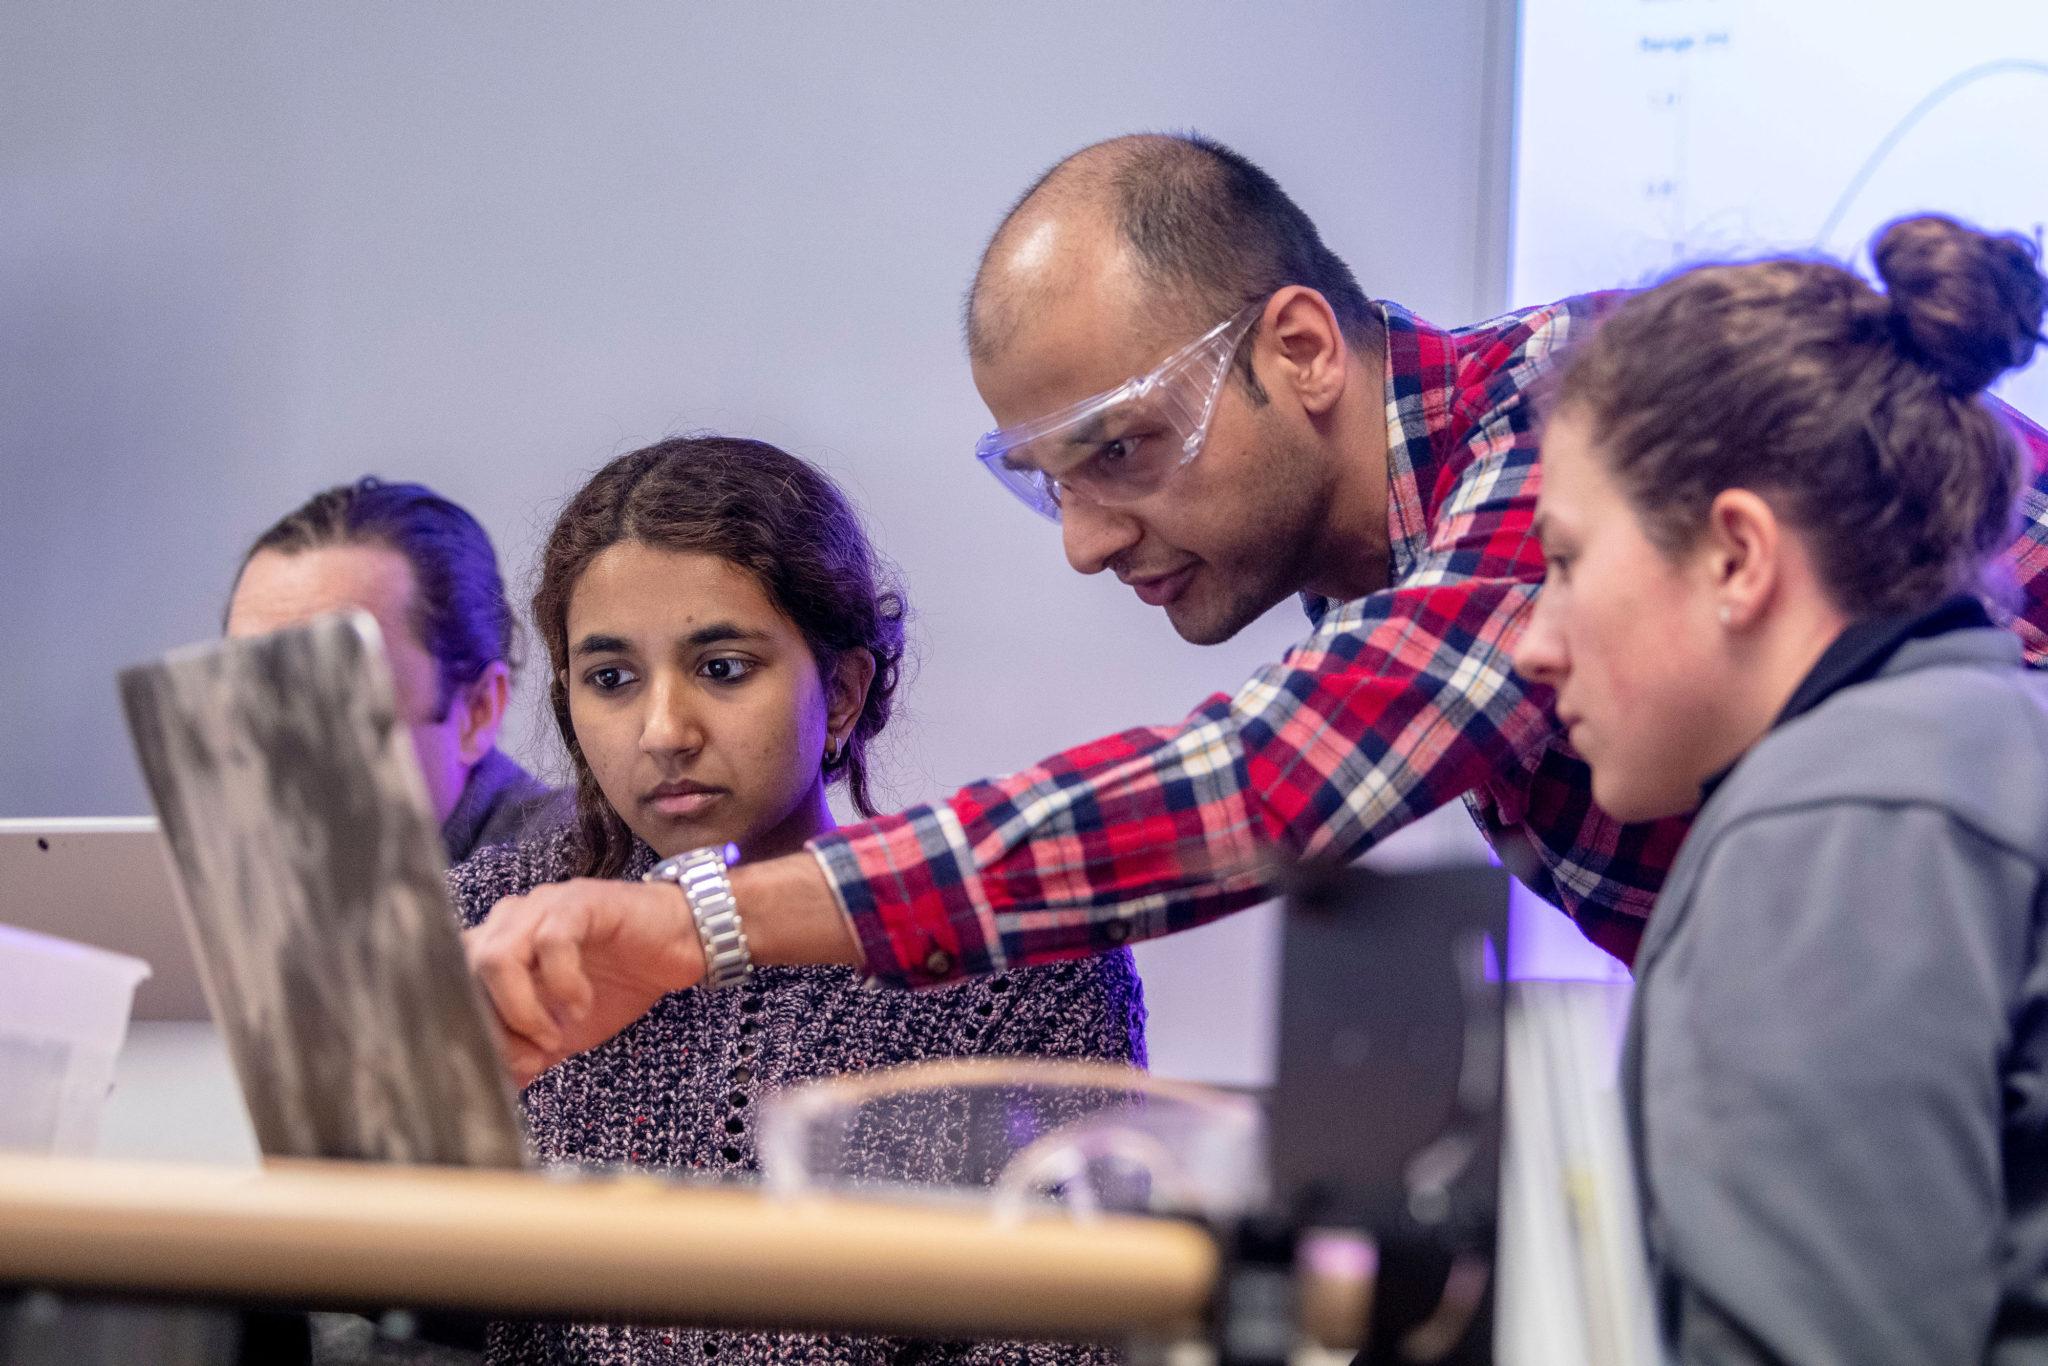 Students conducting a physics experiment